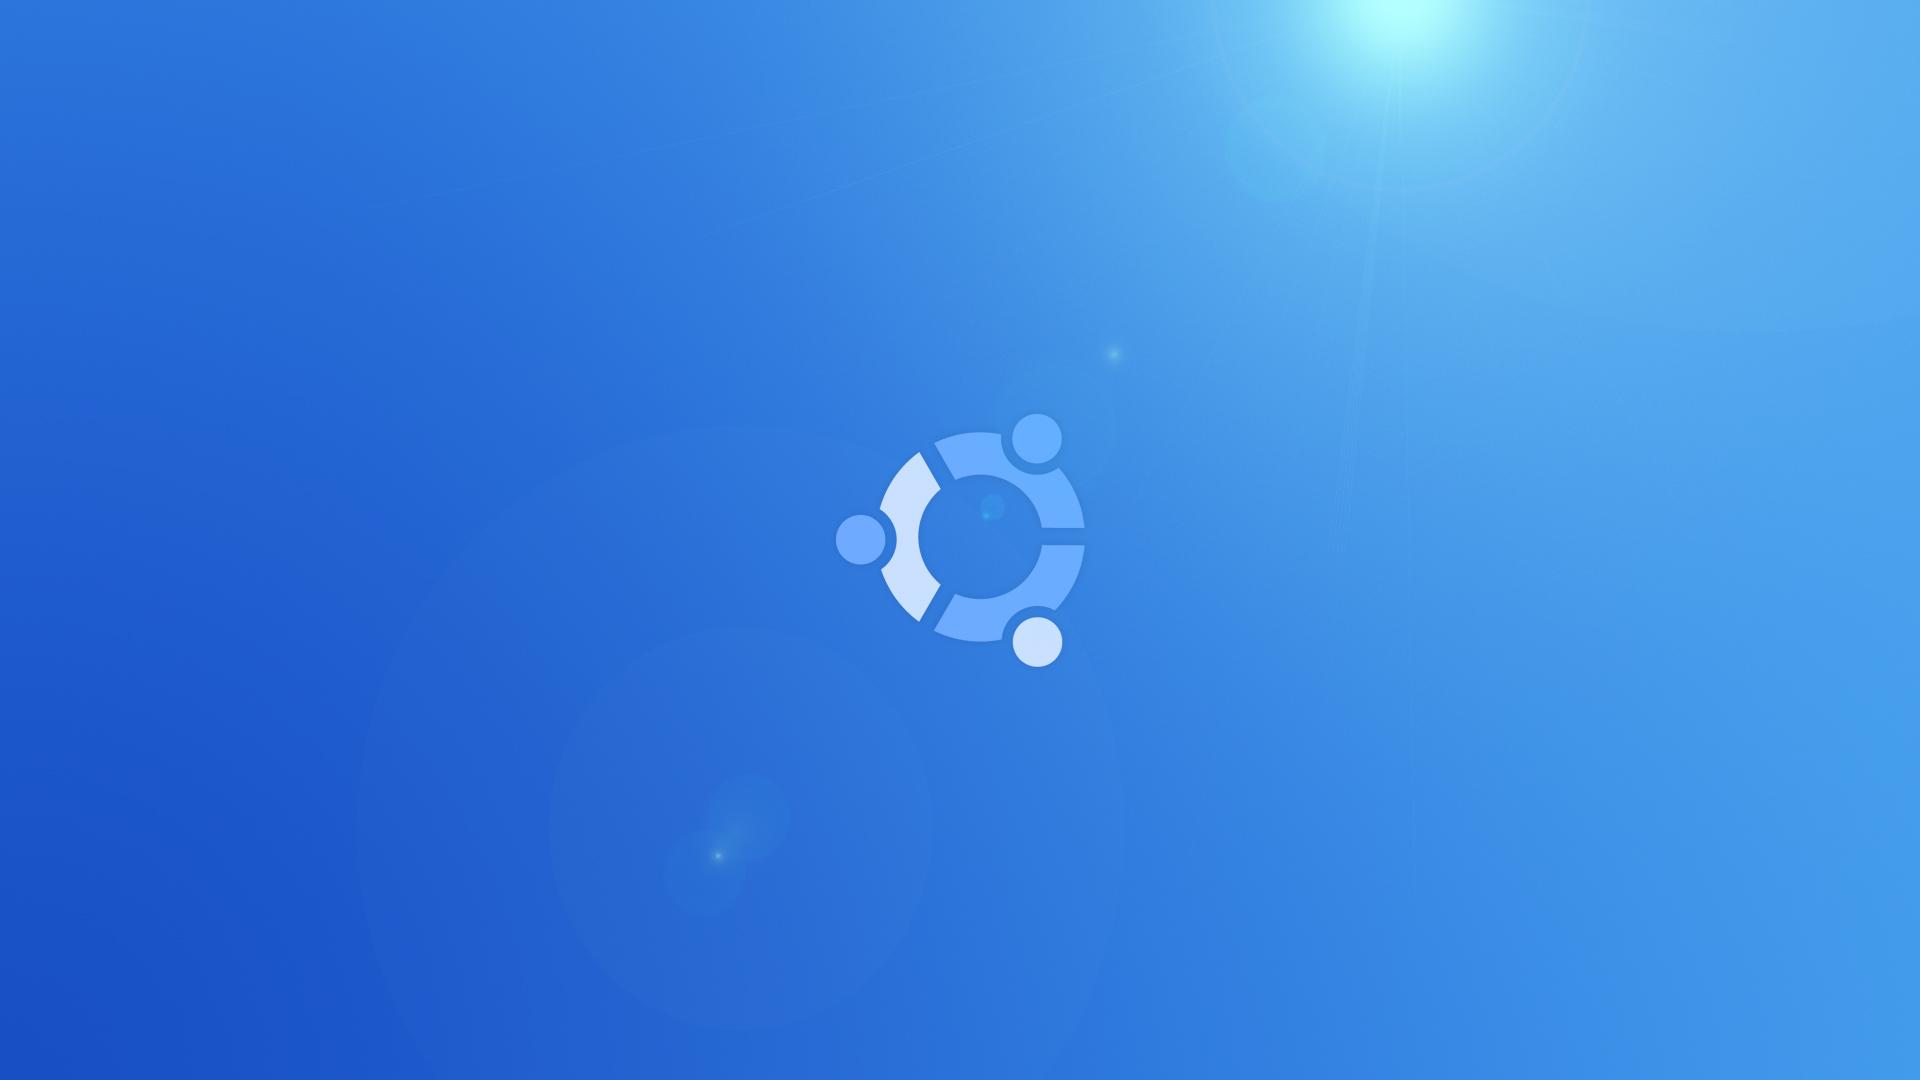 ubuntu wallpaper linux morzze 1920x1080